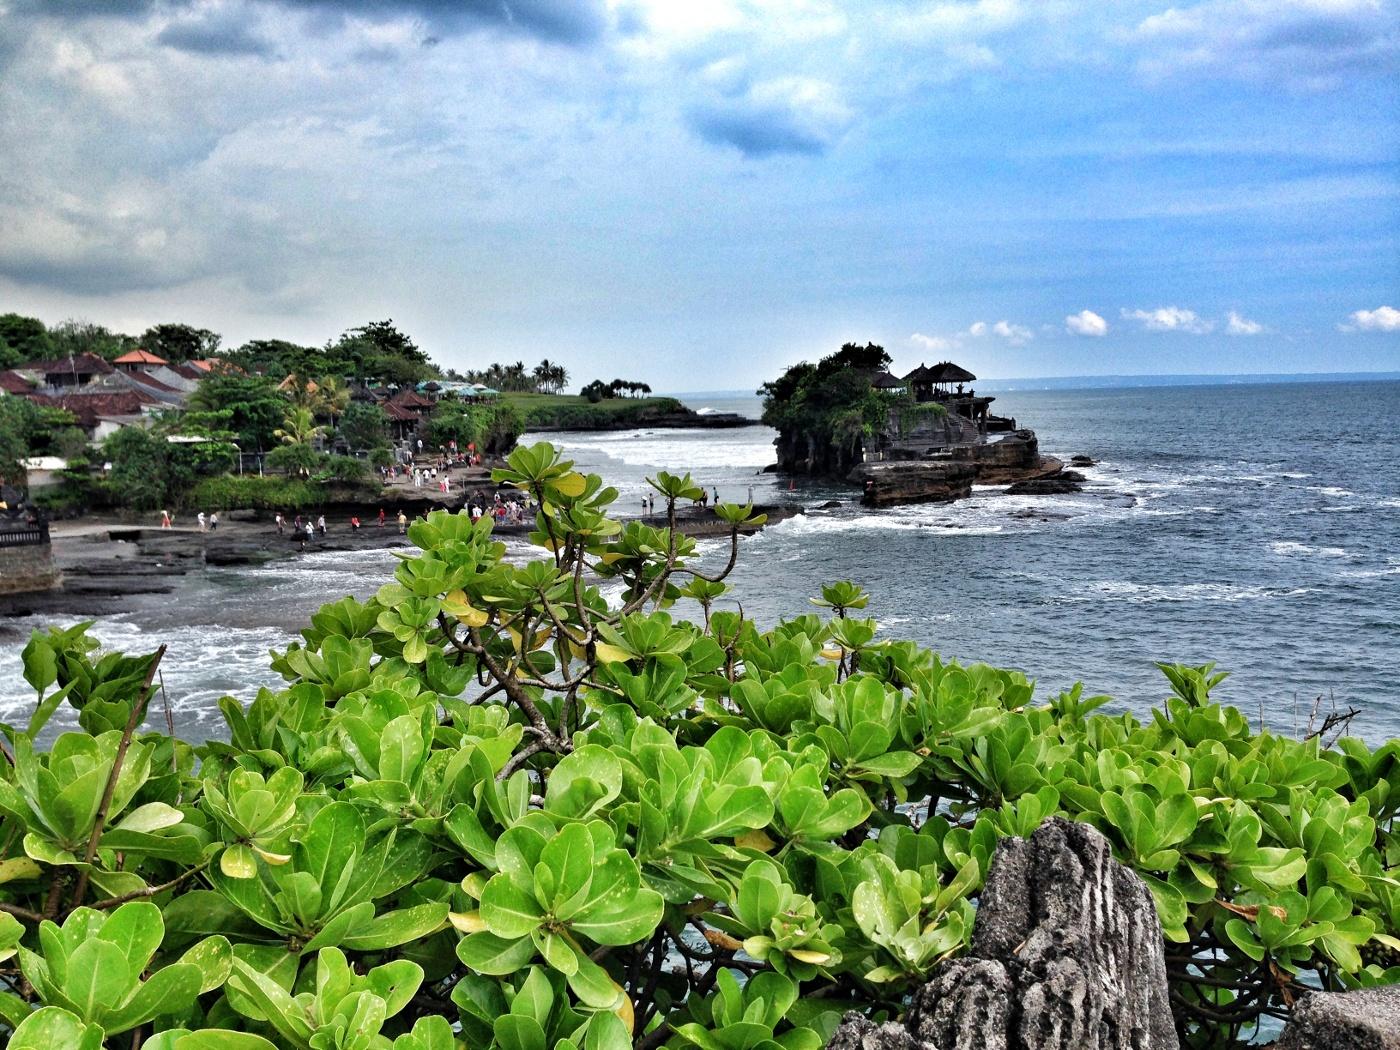 Temple Tanah lot (No. 2 of the Bali travel tips)